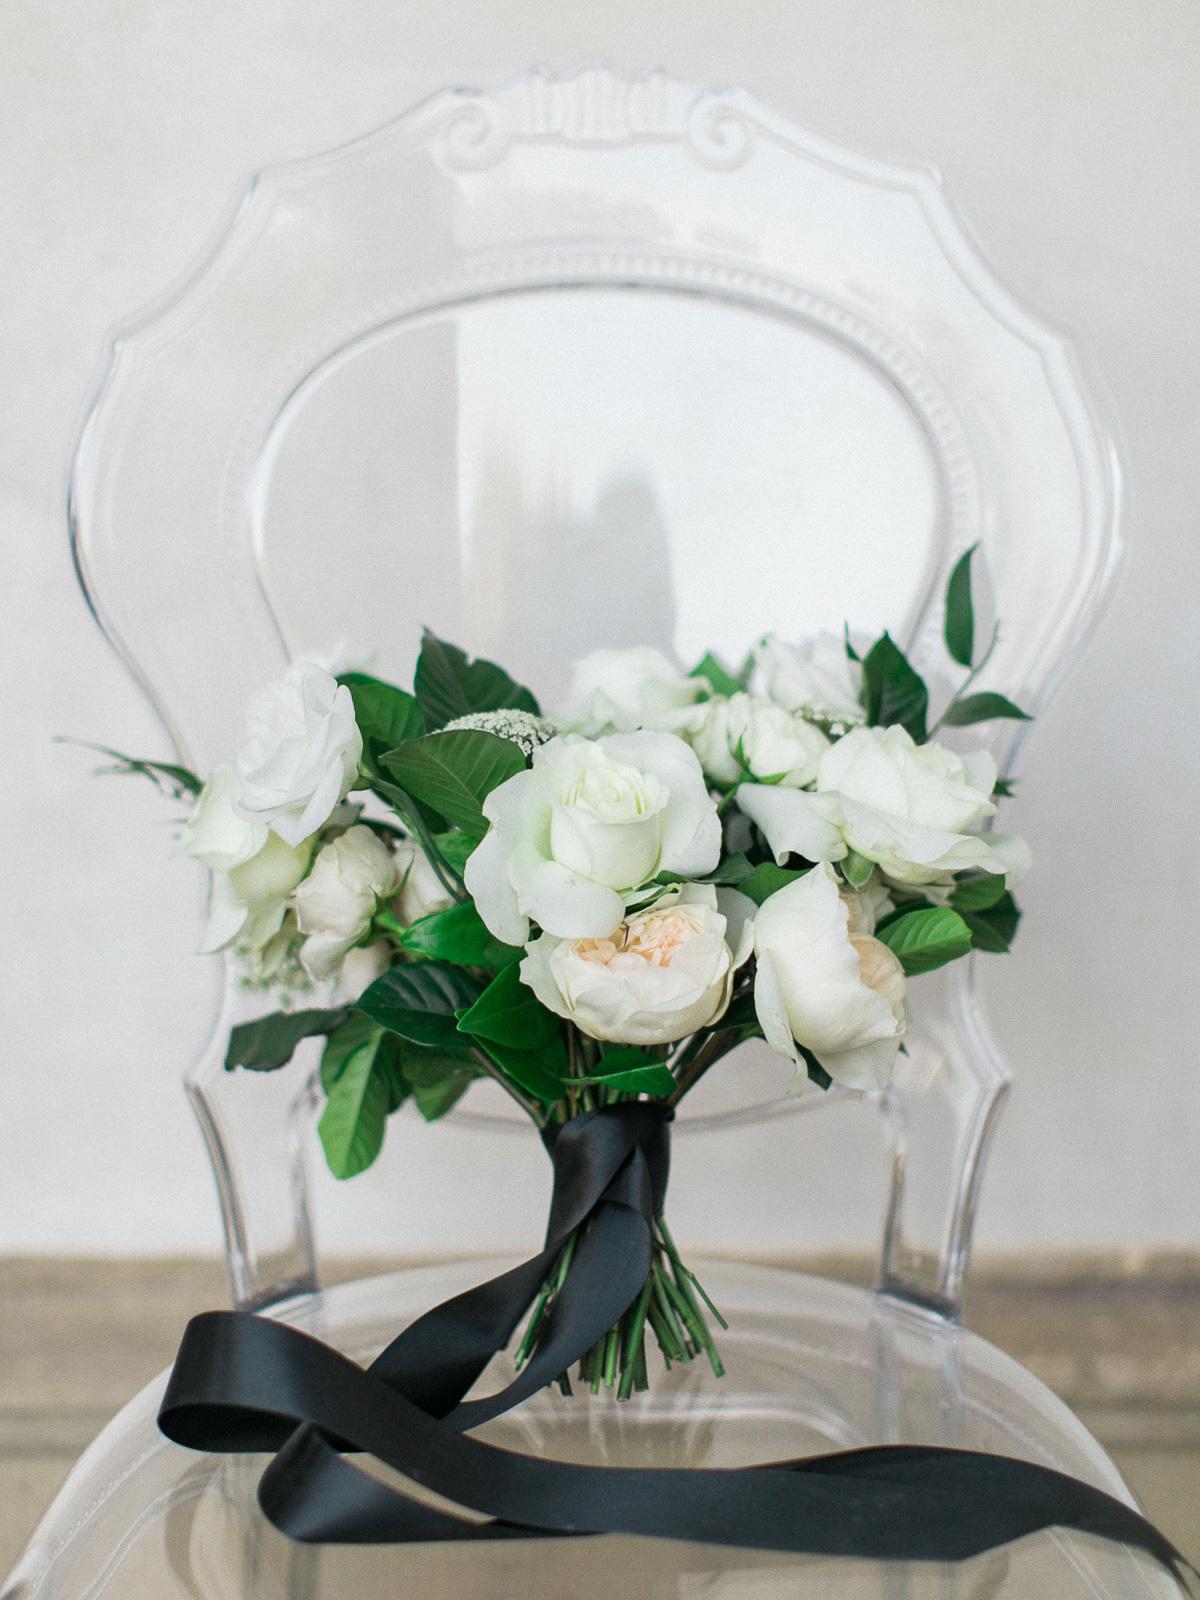 kurtz-orpia-photography-vineyard-bride-swish-list-dundurn-castle-dundas-wedding-editorial-15.jpg